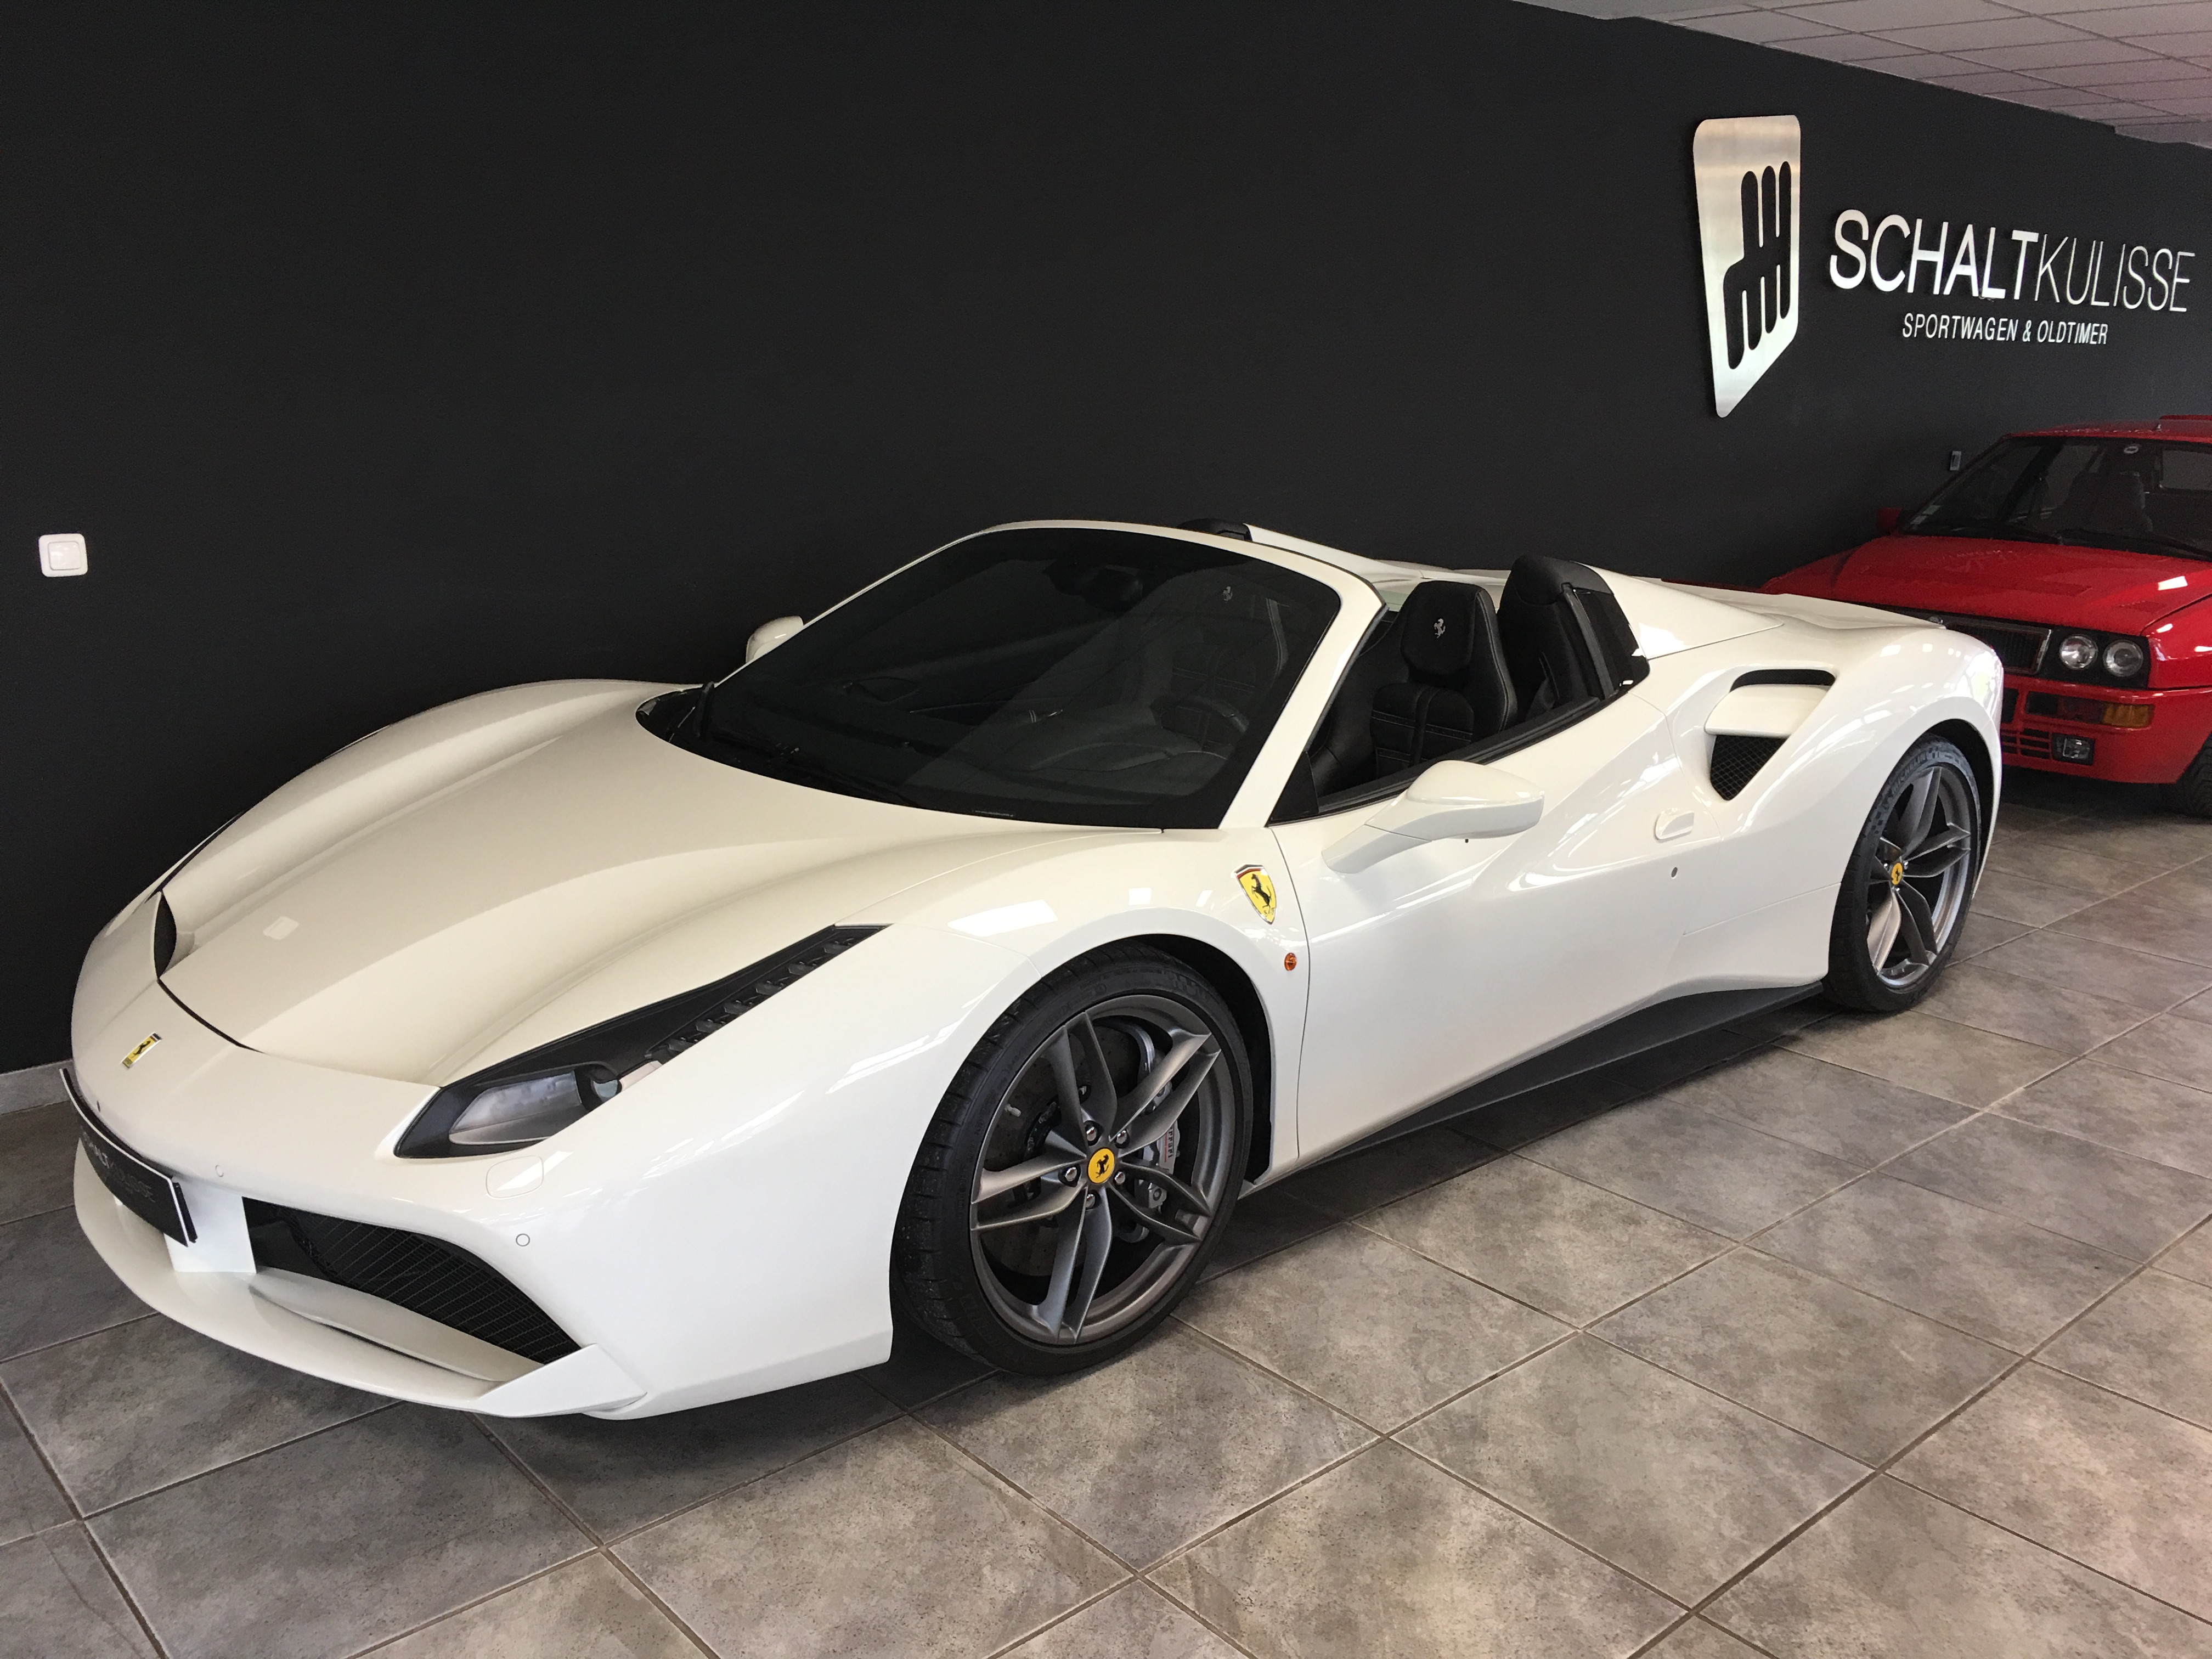 https://www.sportwagen-versicherungen.de/wp-content/uploads/Ferrari_488_Spider_1.jpg